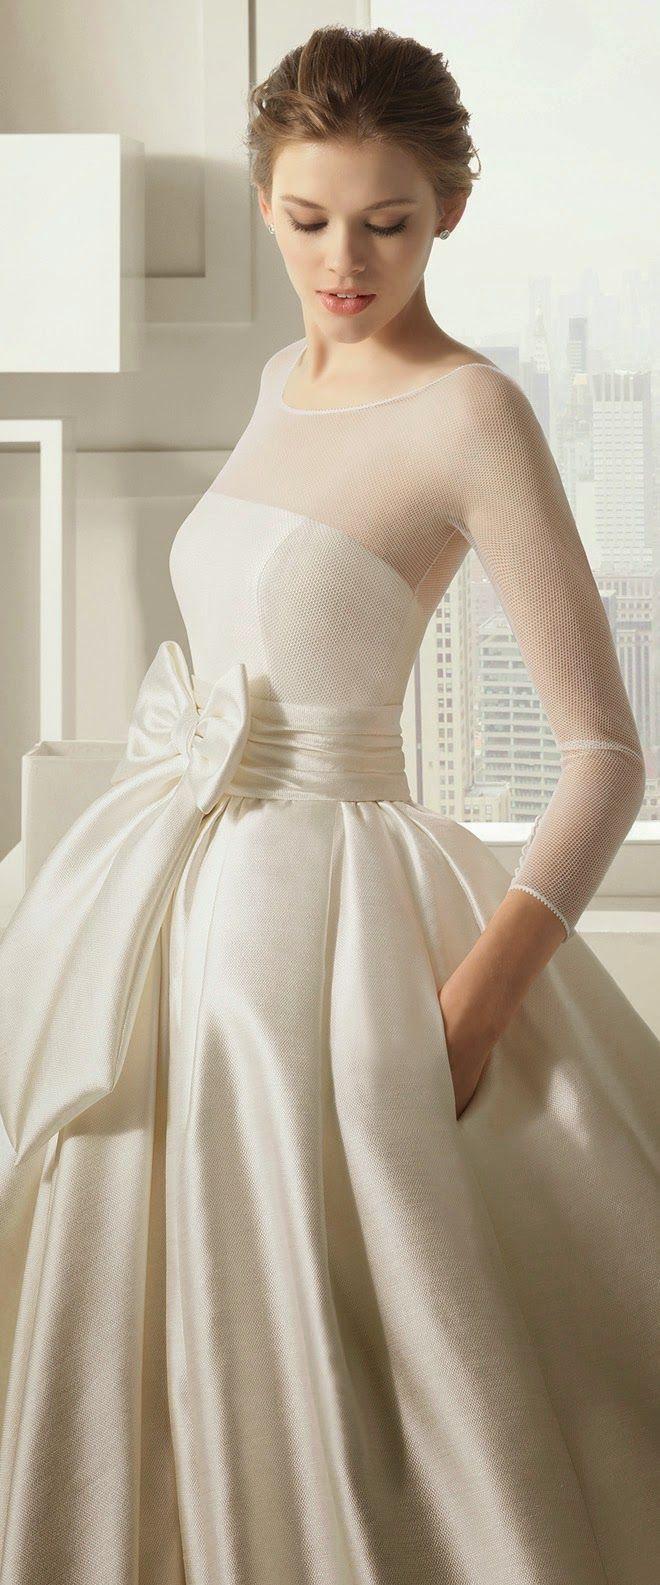 best images about dresses dresses dresses on pinterest